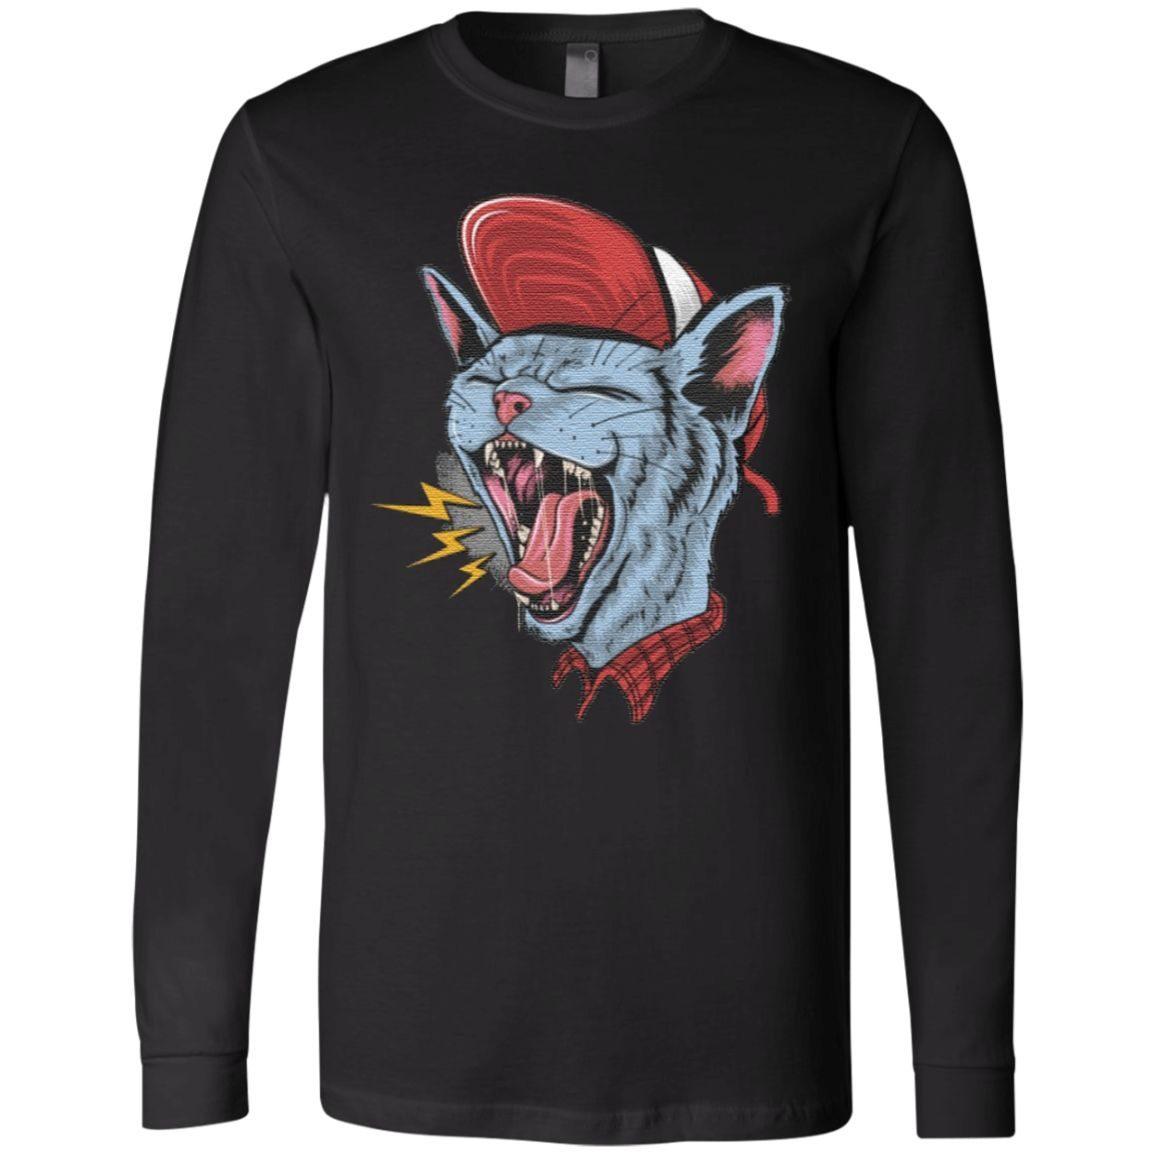 Rock n roll cat Classic T-Shirt